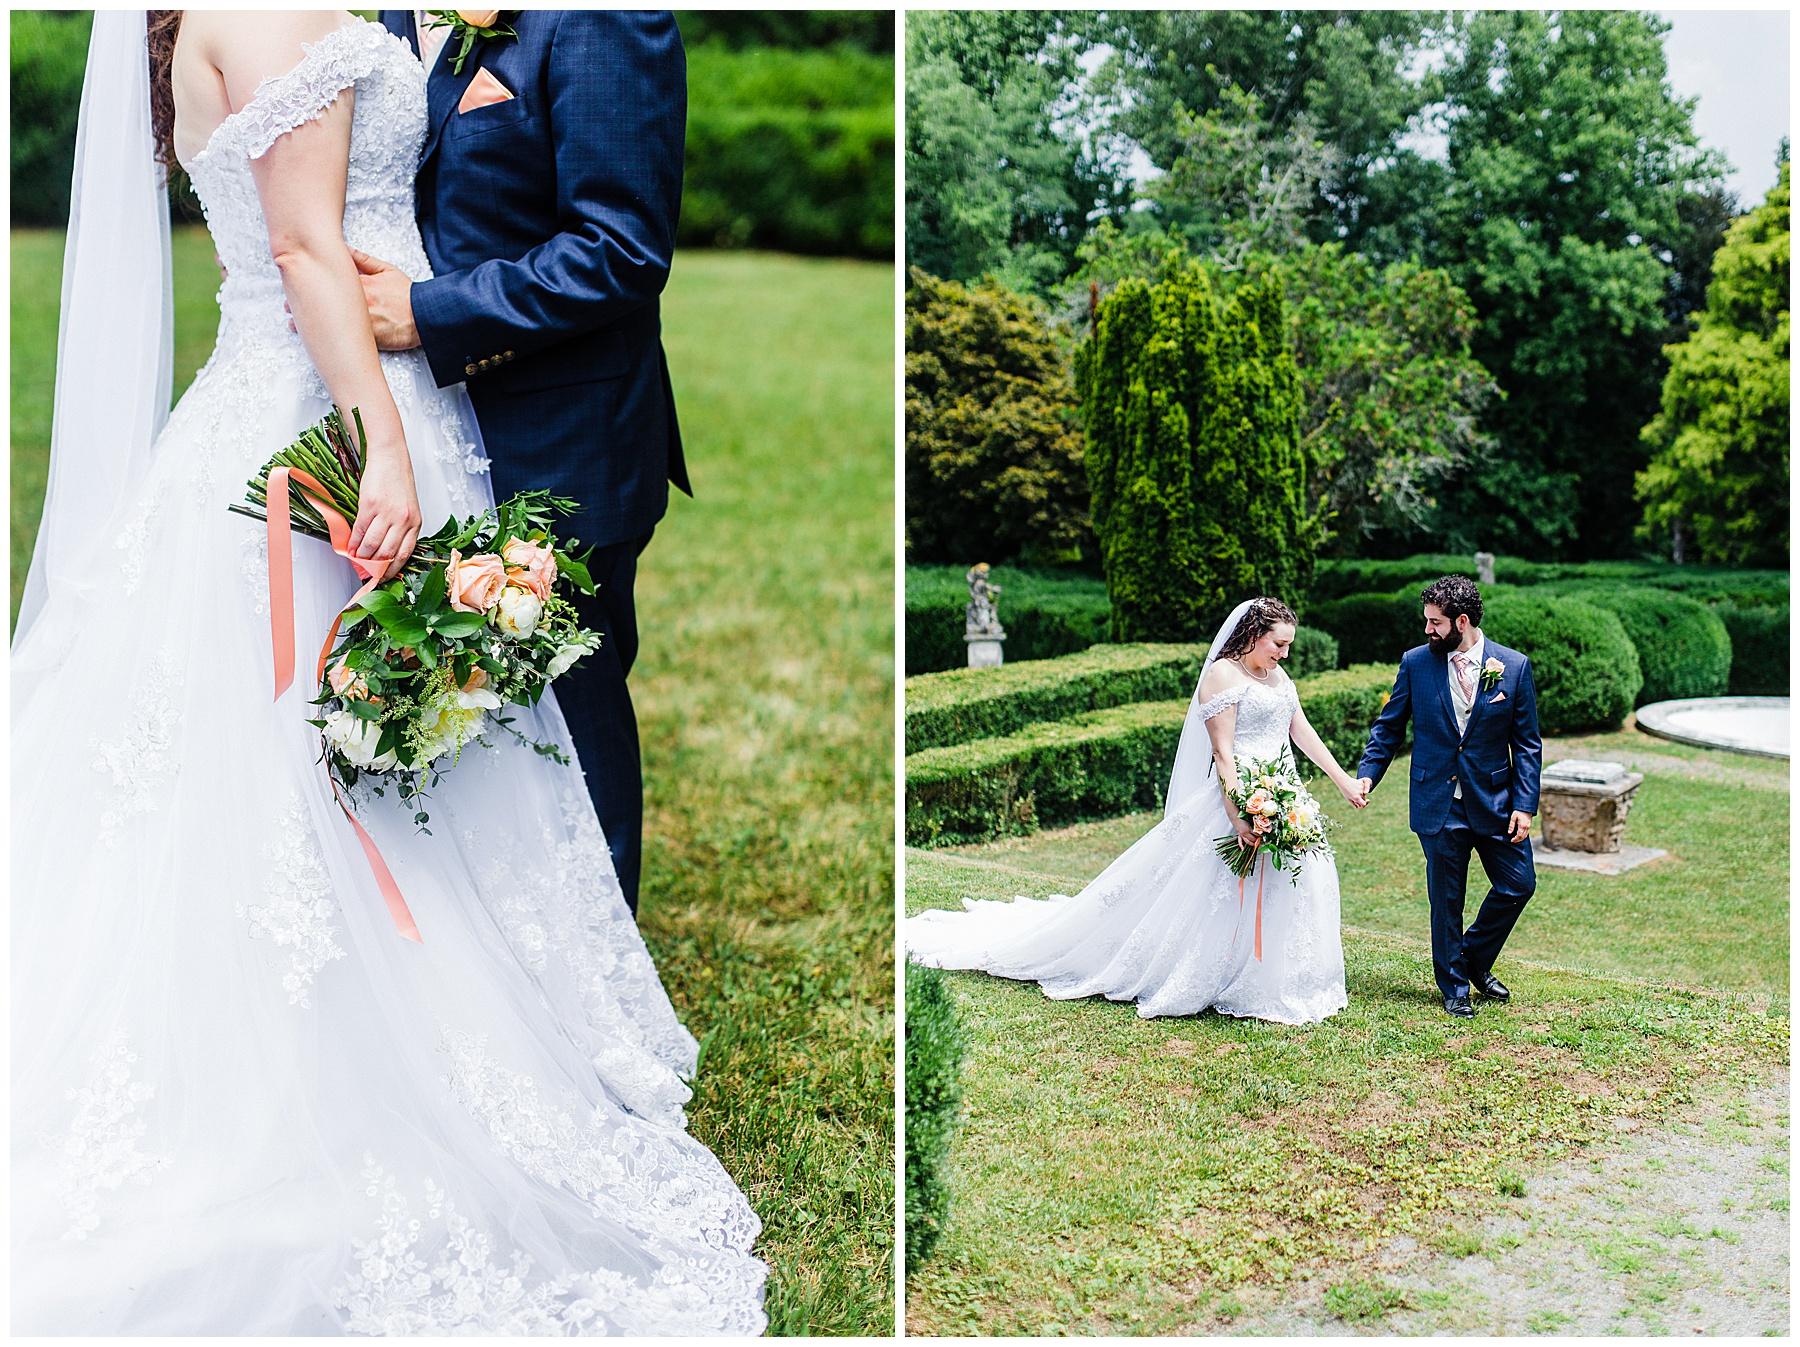 oak-ridge-estate-wedding-virginia-photographer18.jpg